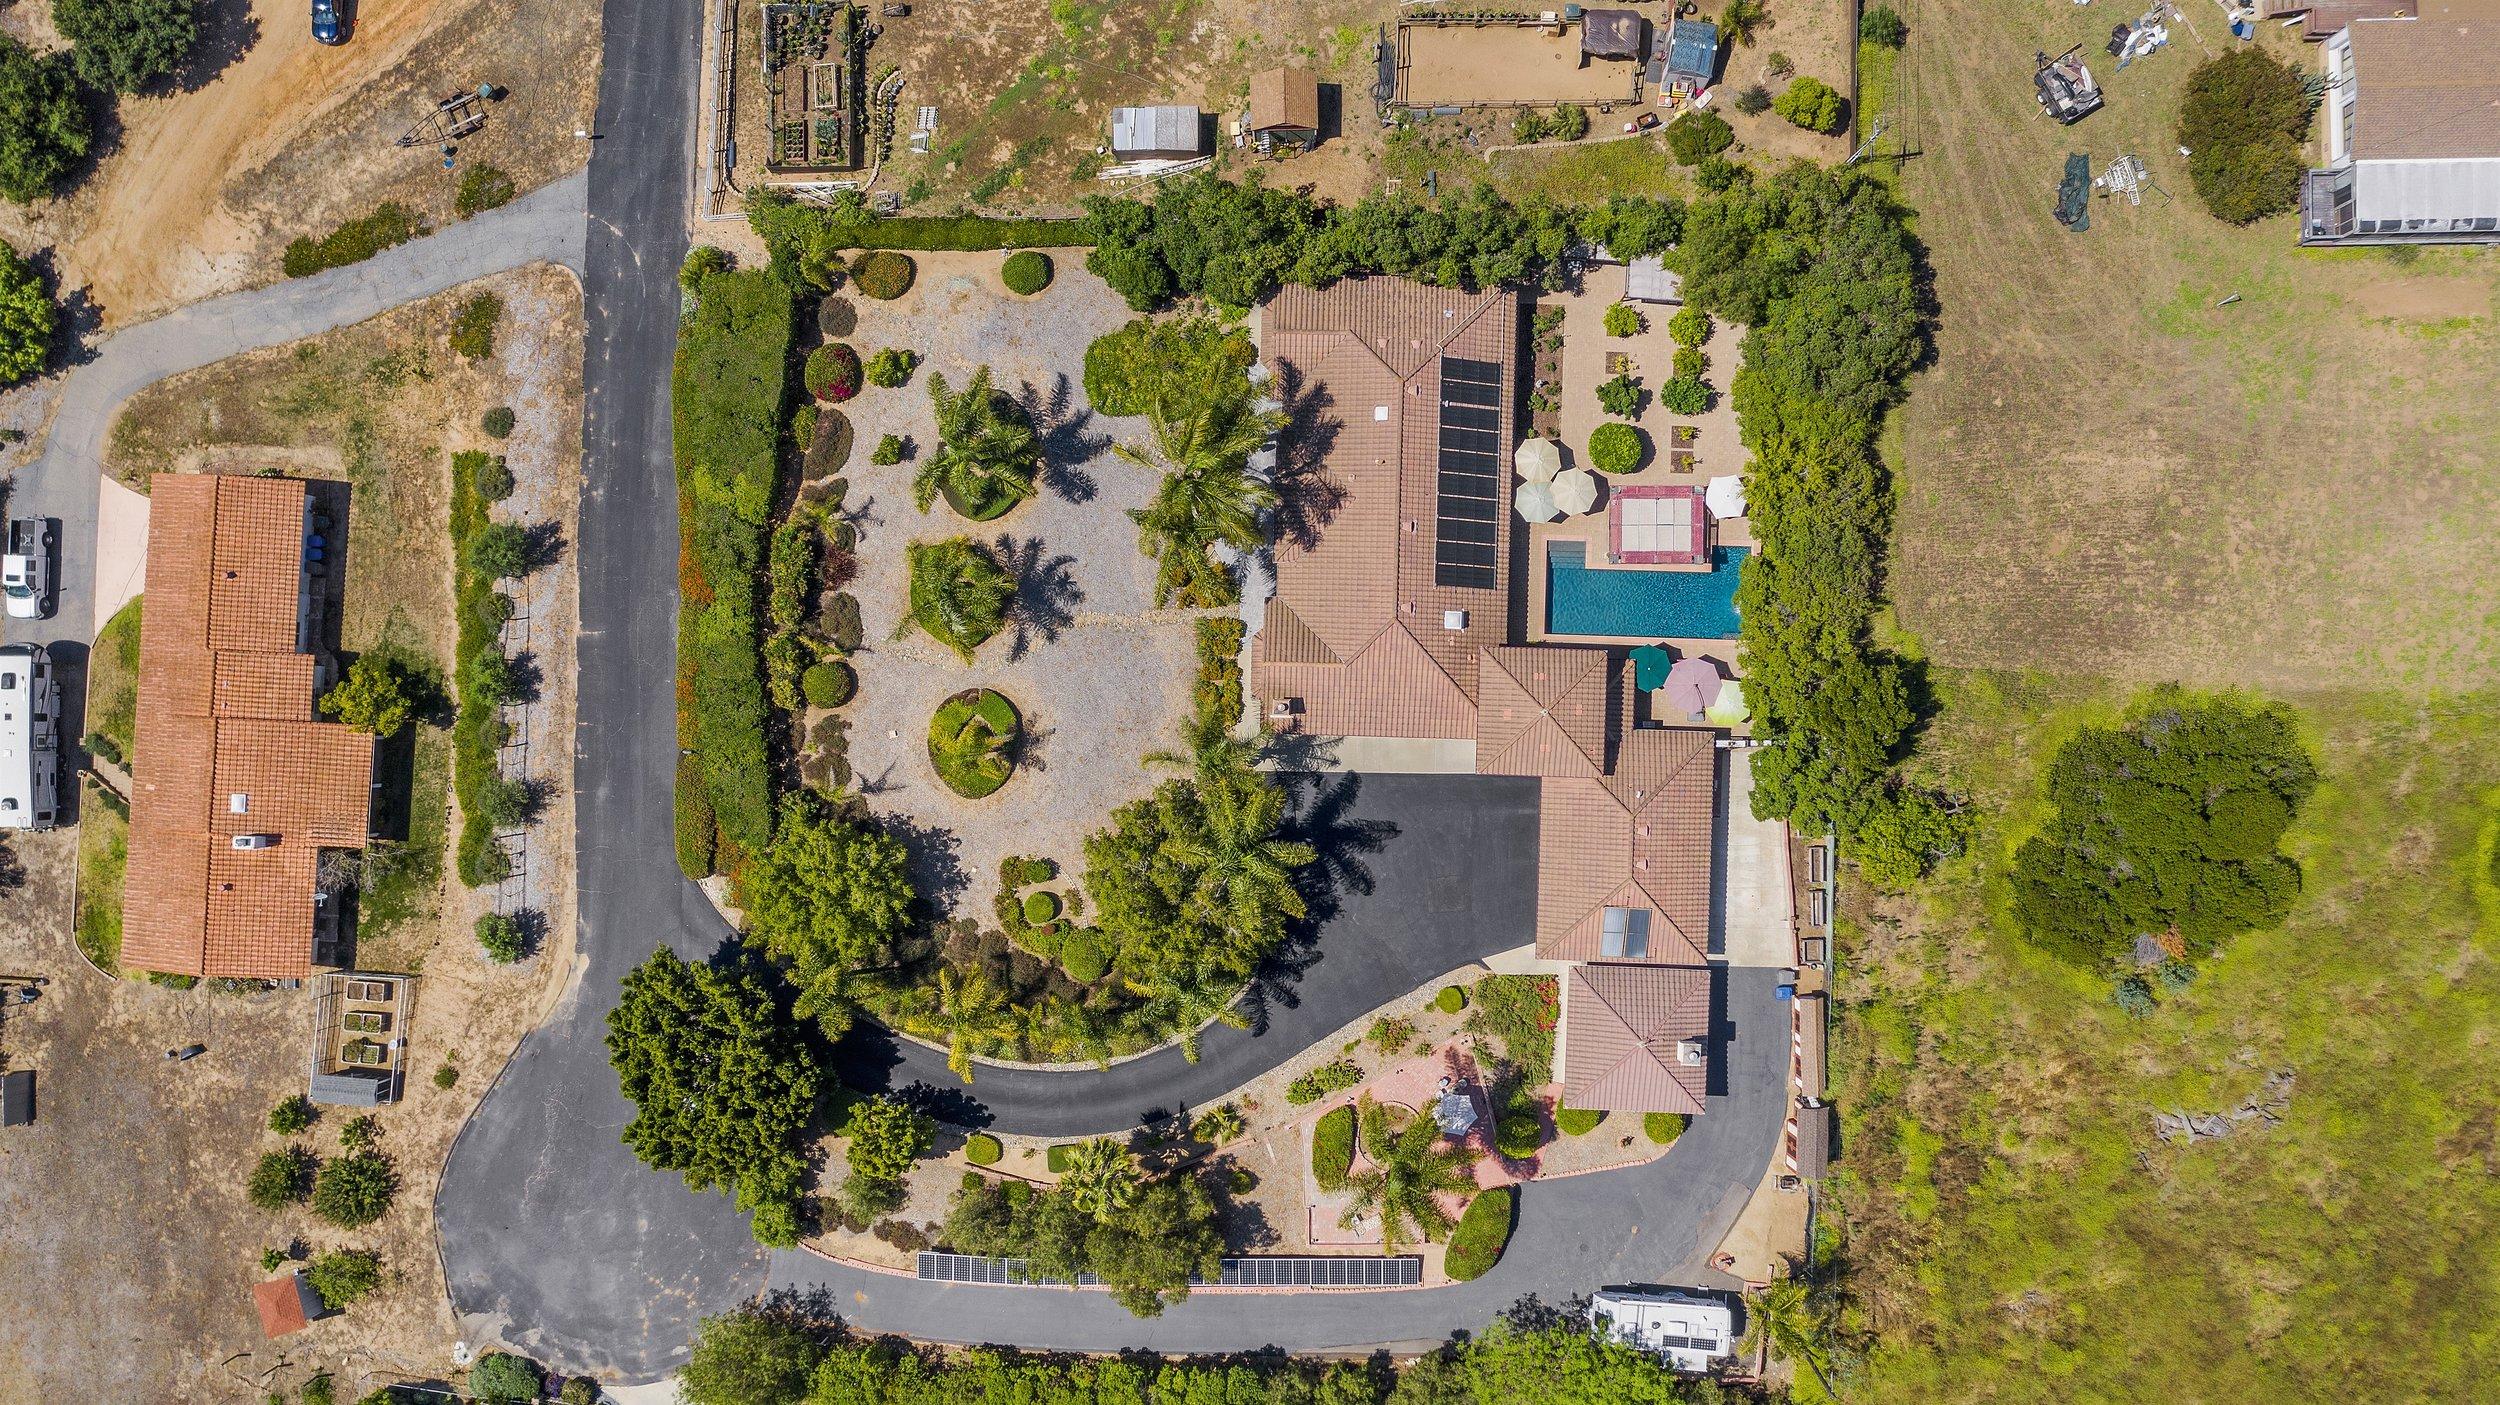 056_Aerial Property View.jpg